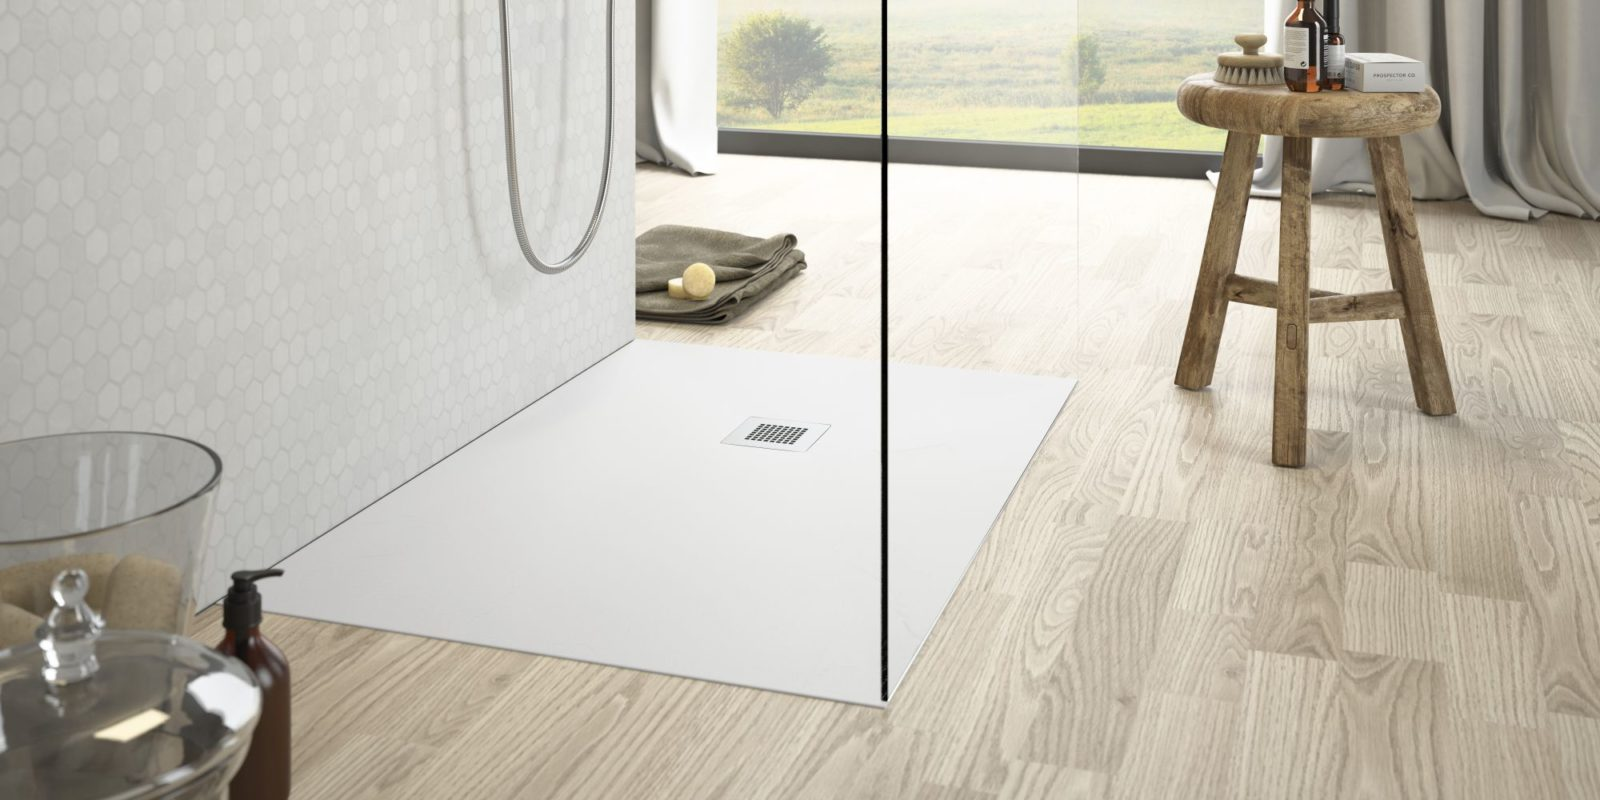 Softboard_Soft-Board_Duschwannen-nach-Maß_Duschwanne-Bodengleich